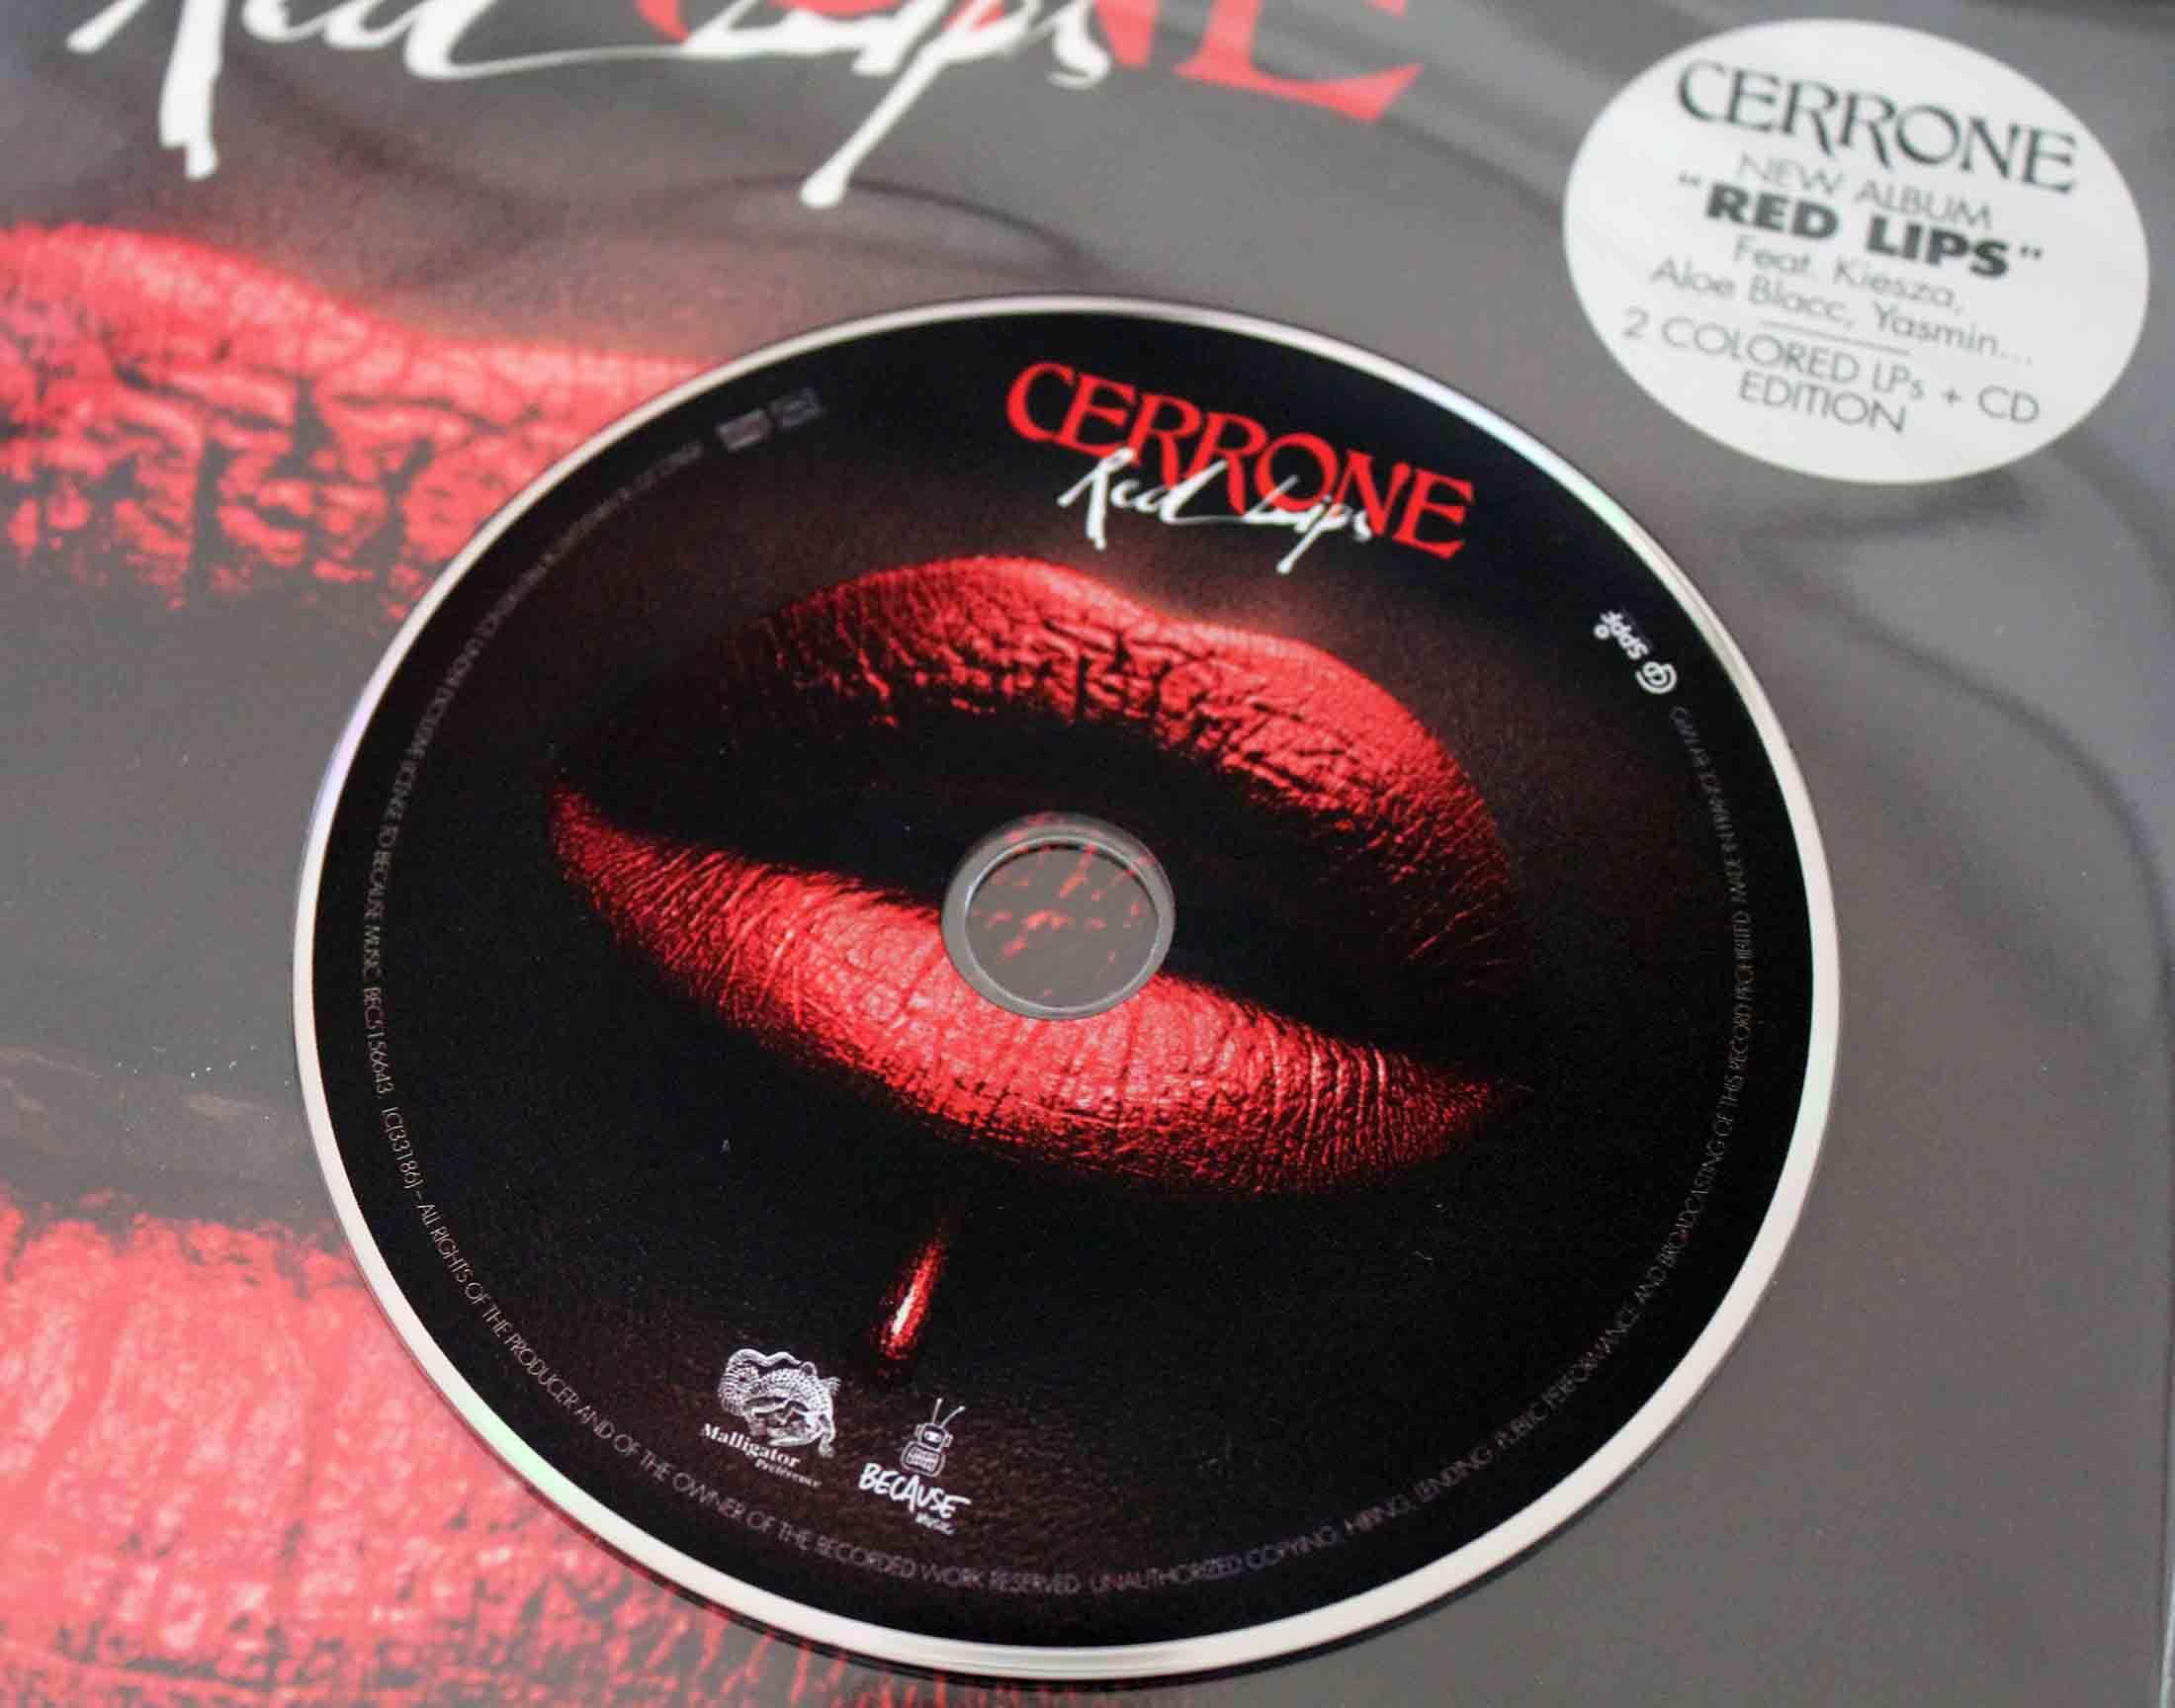 Cerrone (2018) – Red Lips 07